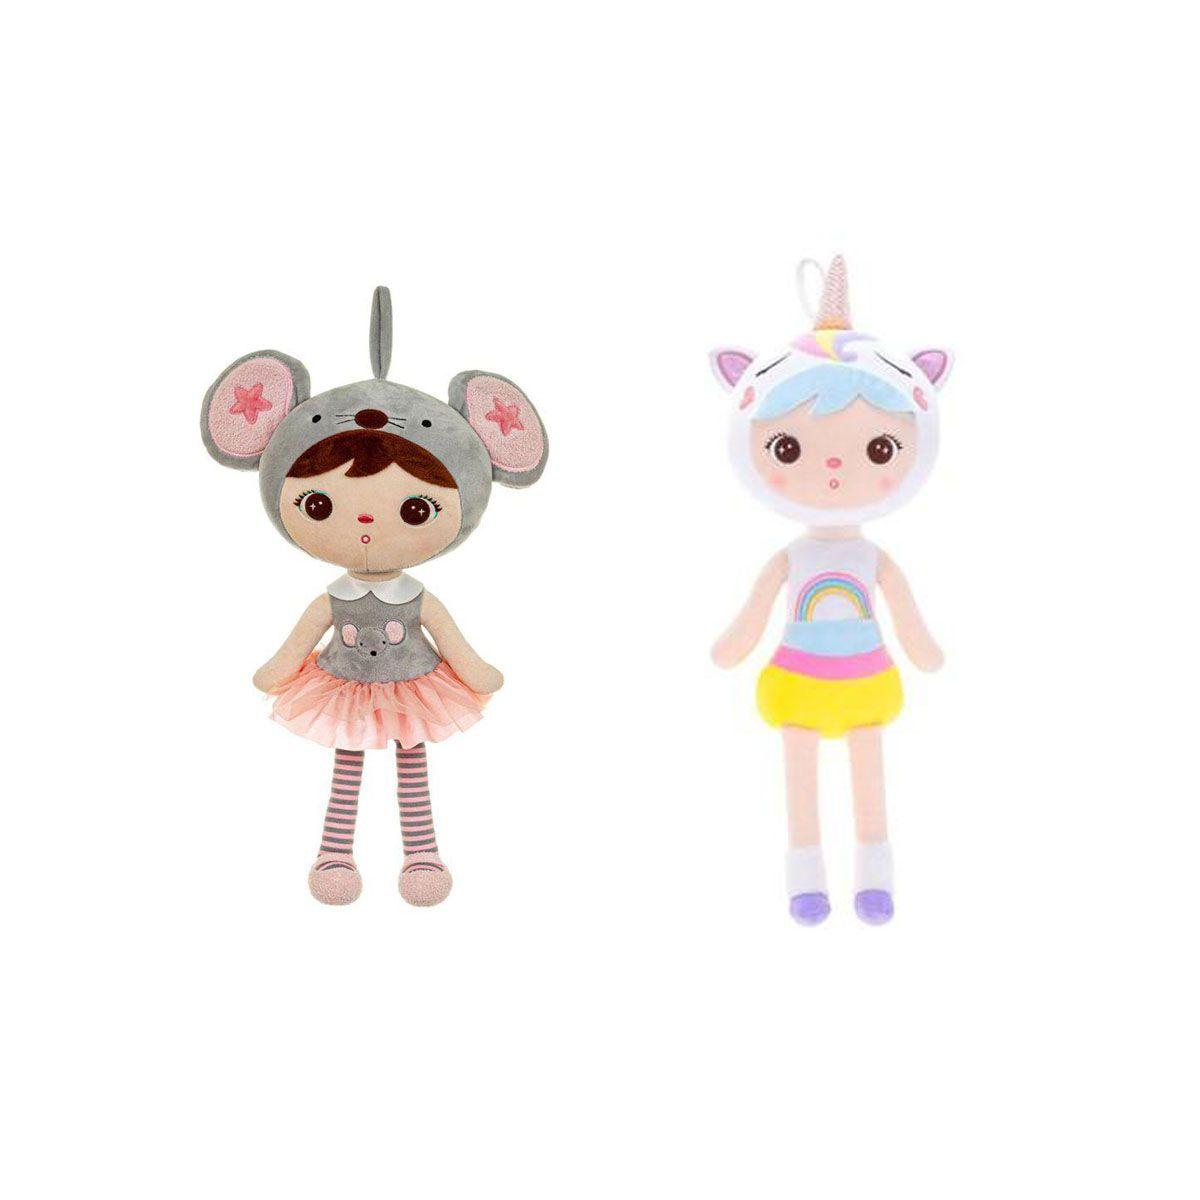 Kit boneca metoo Jimbão 2 bonecas ratinha+unicórnio 42cm